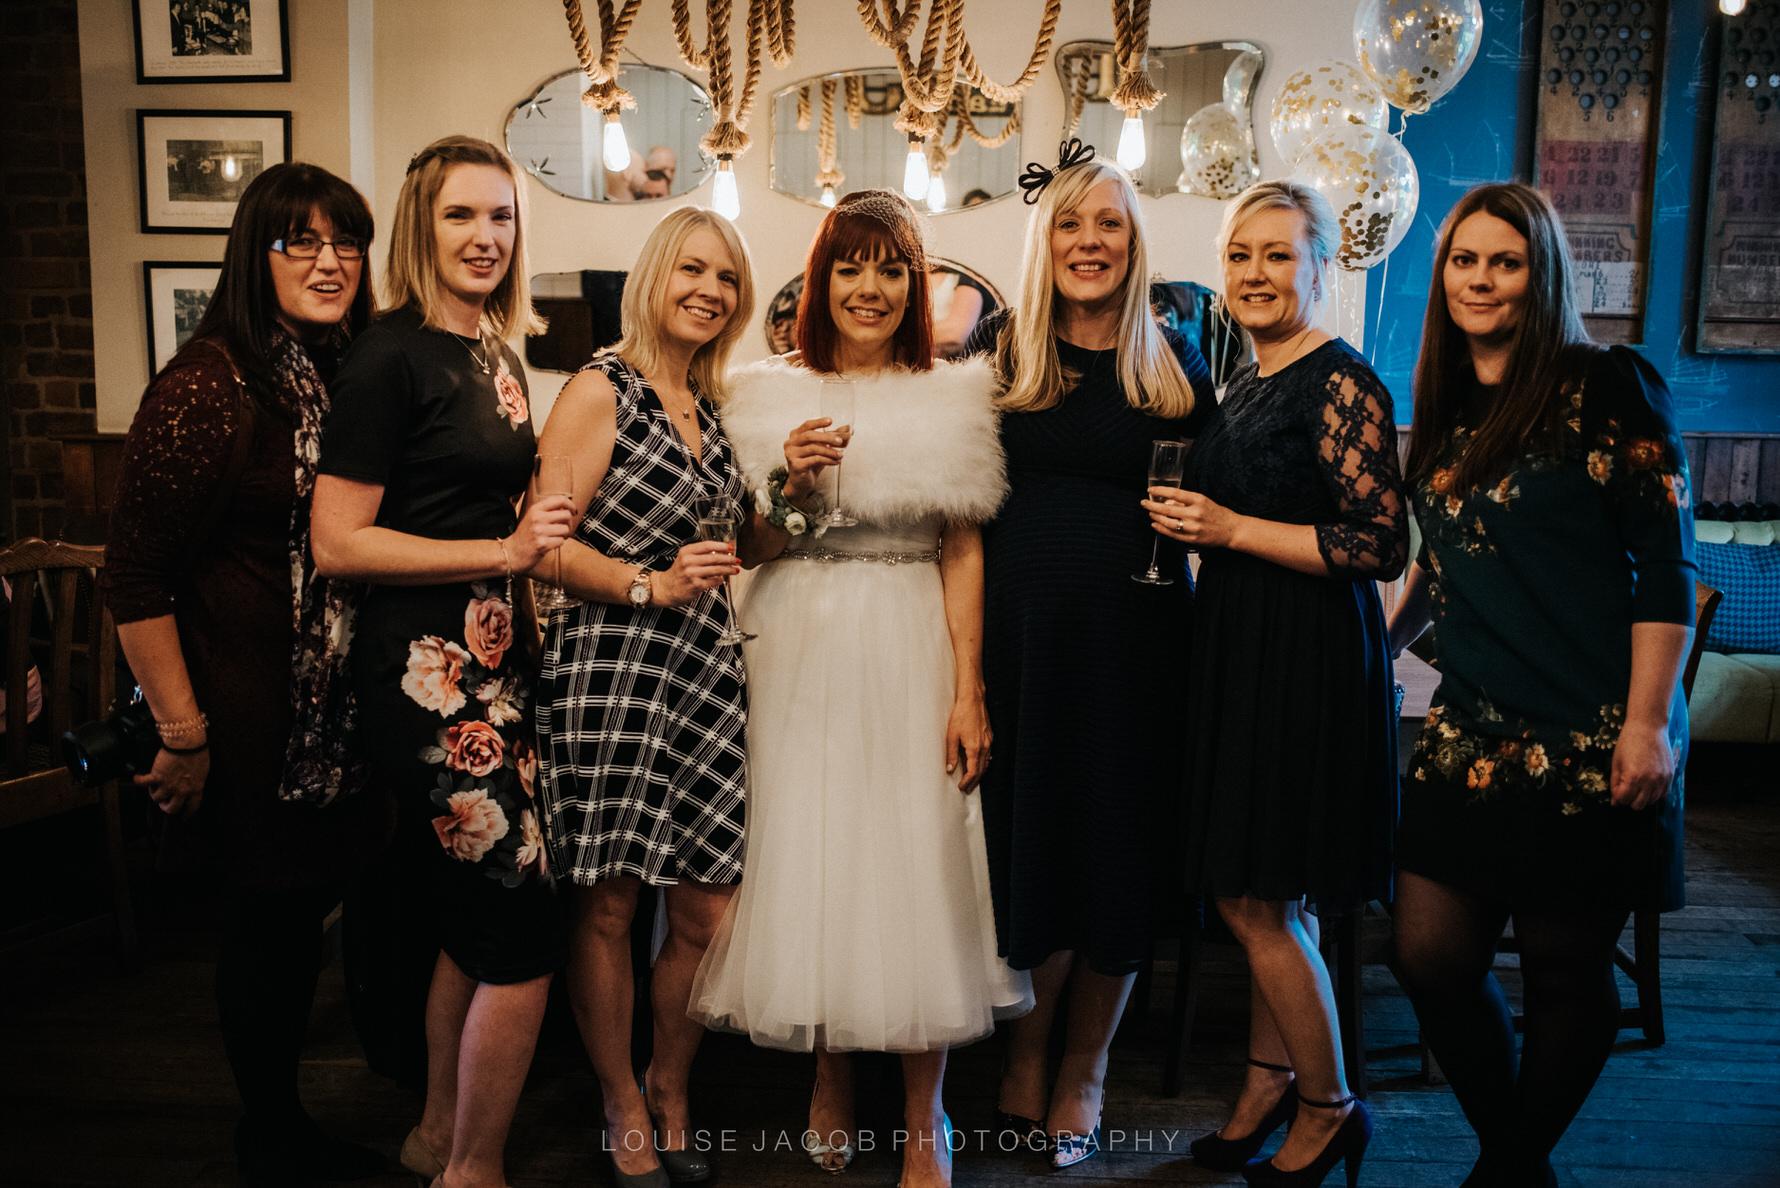 Documentary Wedding Photography - Best of 2017 slideshow